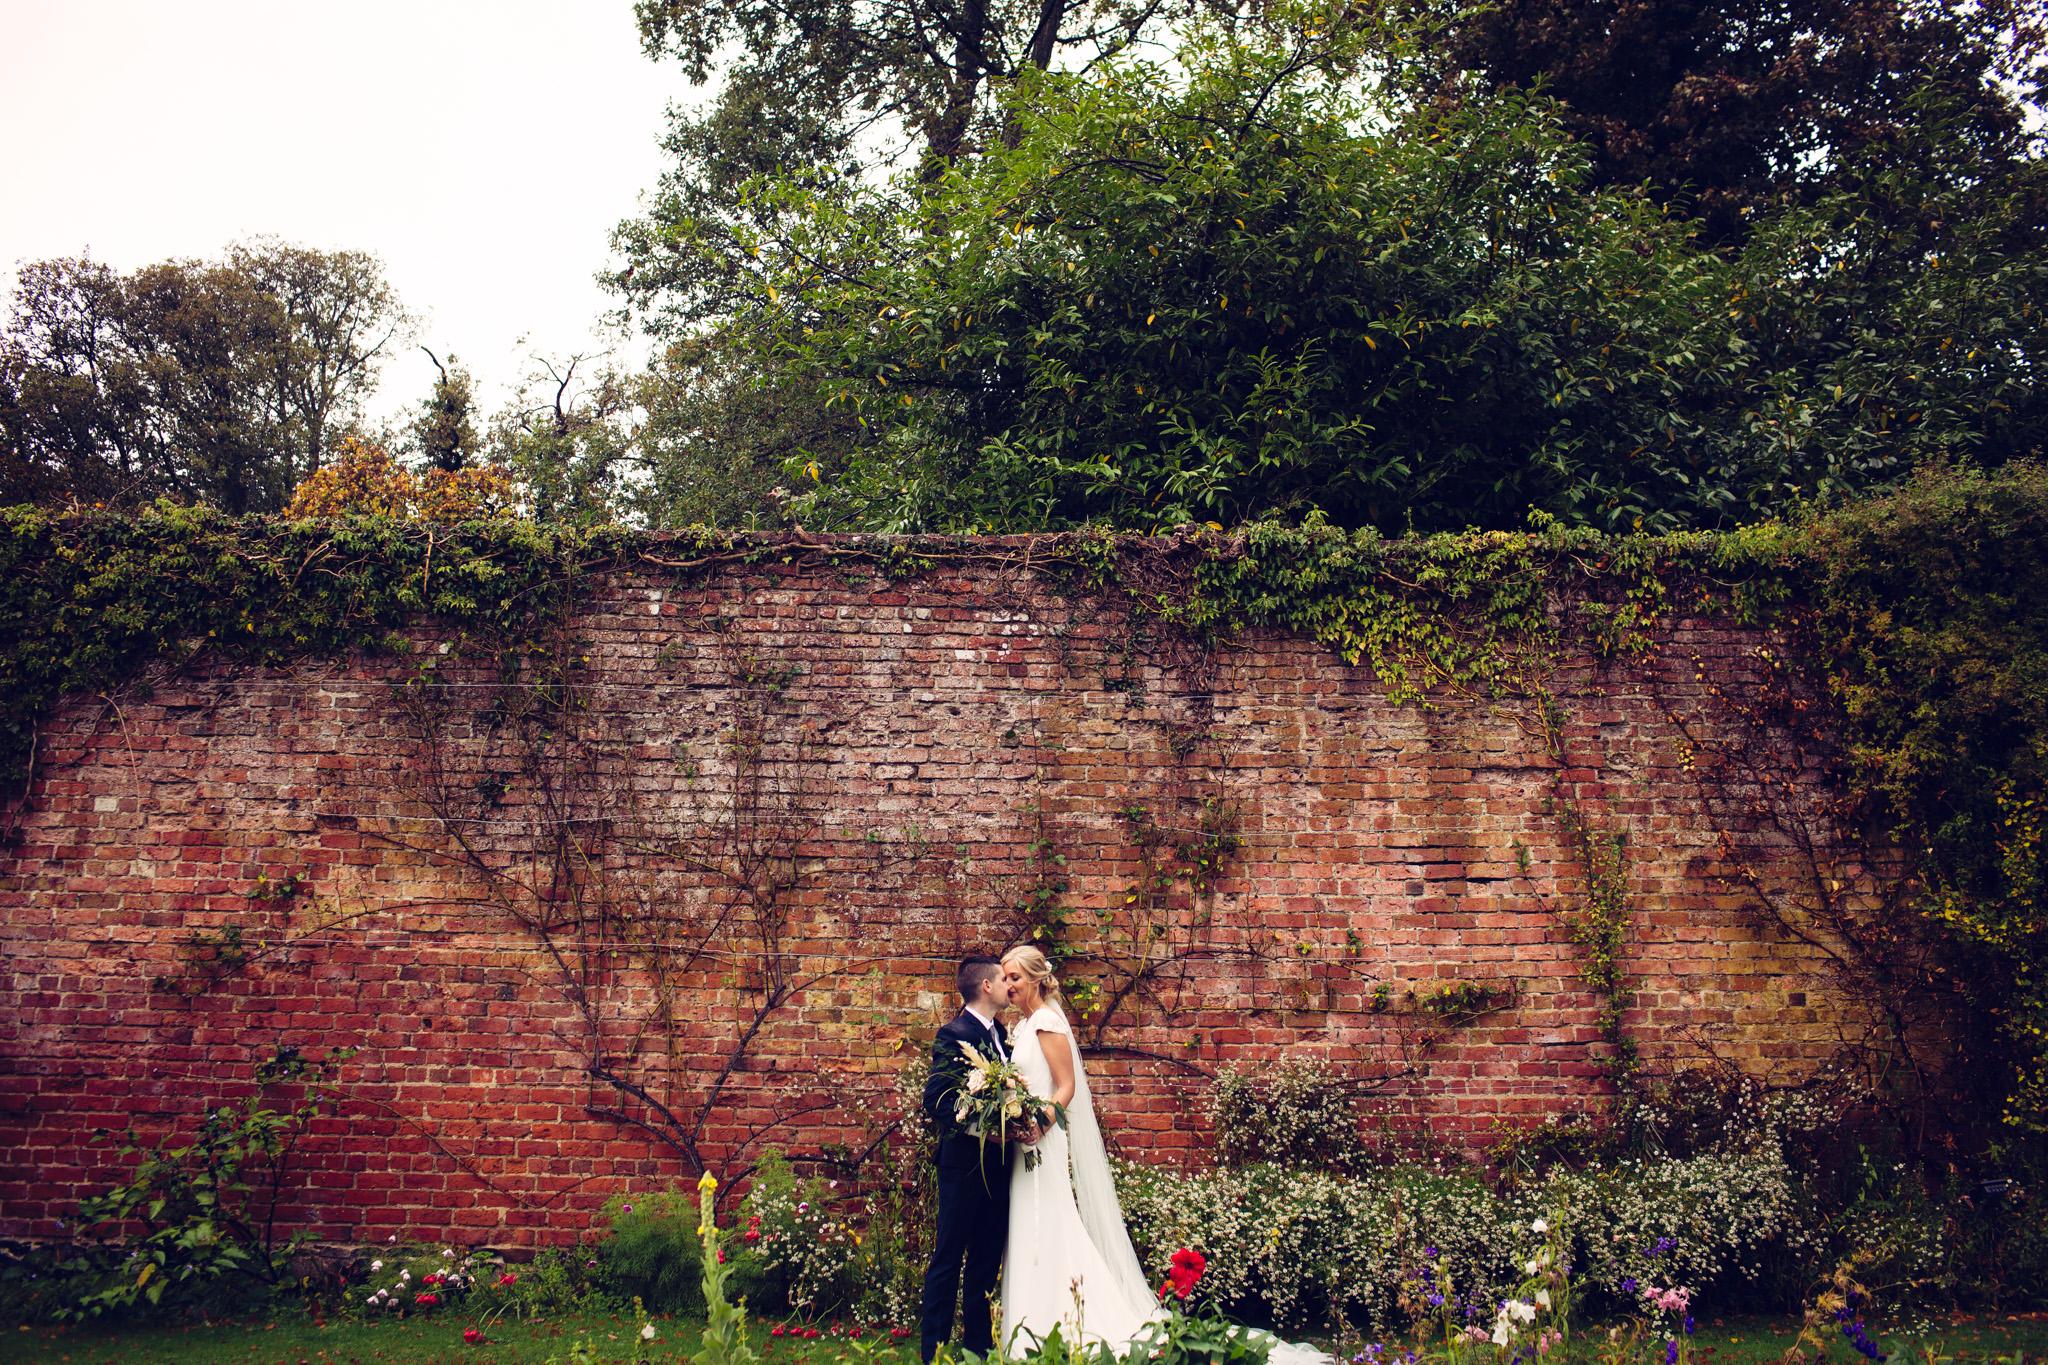 Mark_Barnes_Northern_Ireland_Wedding_Photography_Ballyscullion_Park_Wedding_Photography_Stef&Bobby-35.jpg